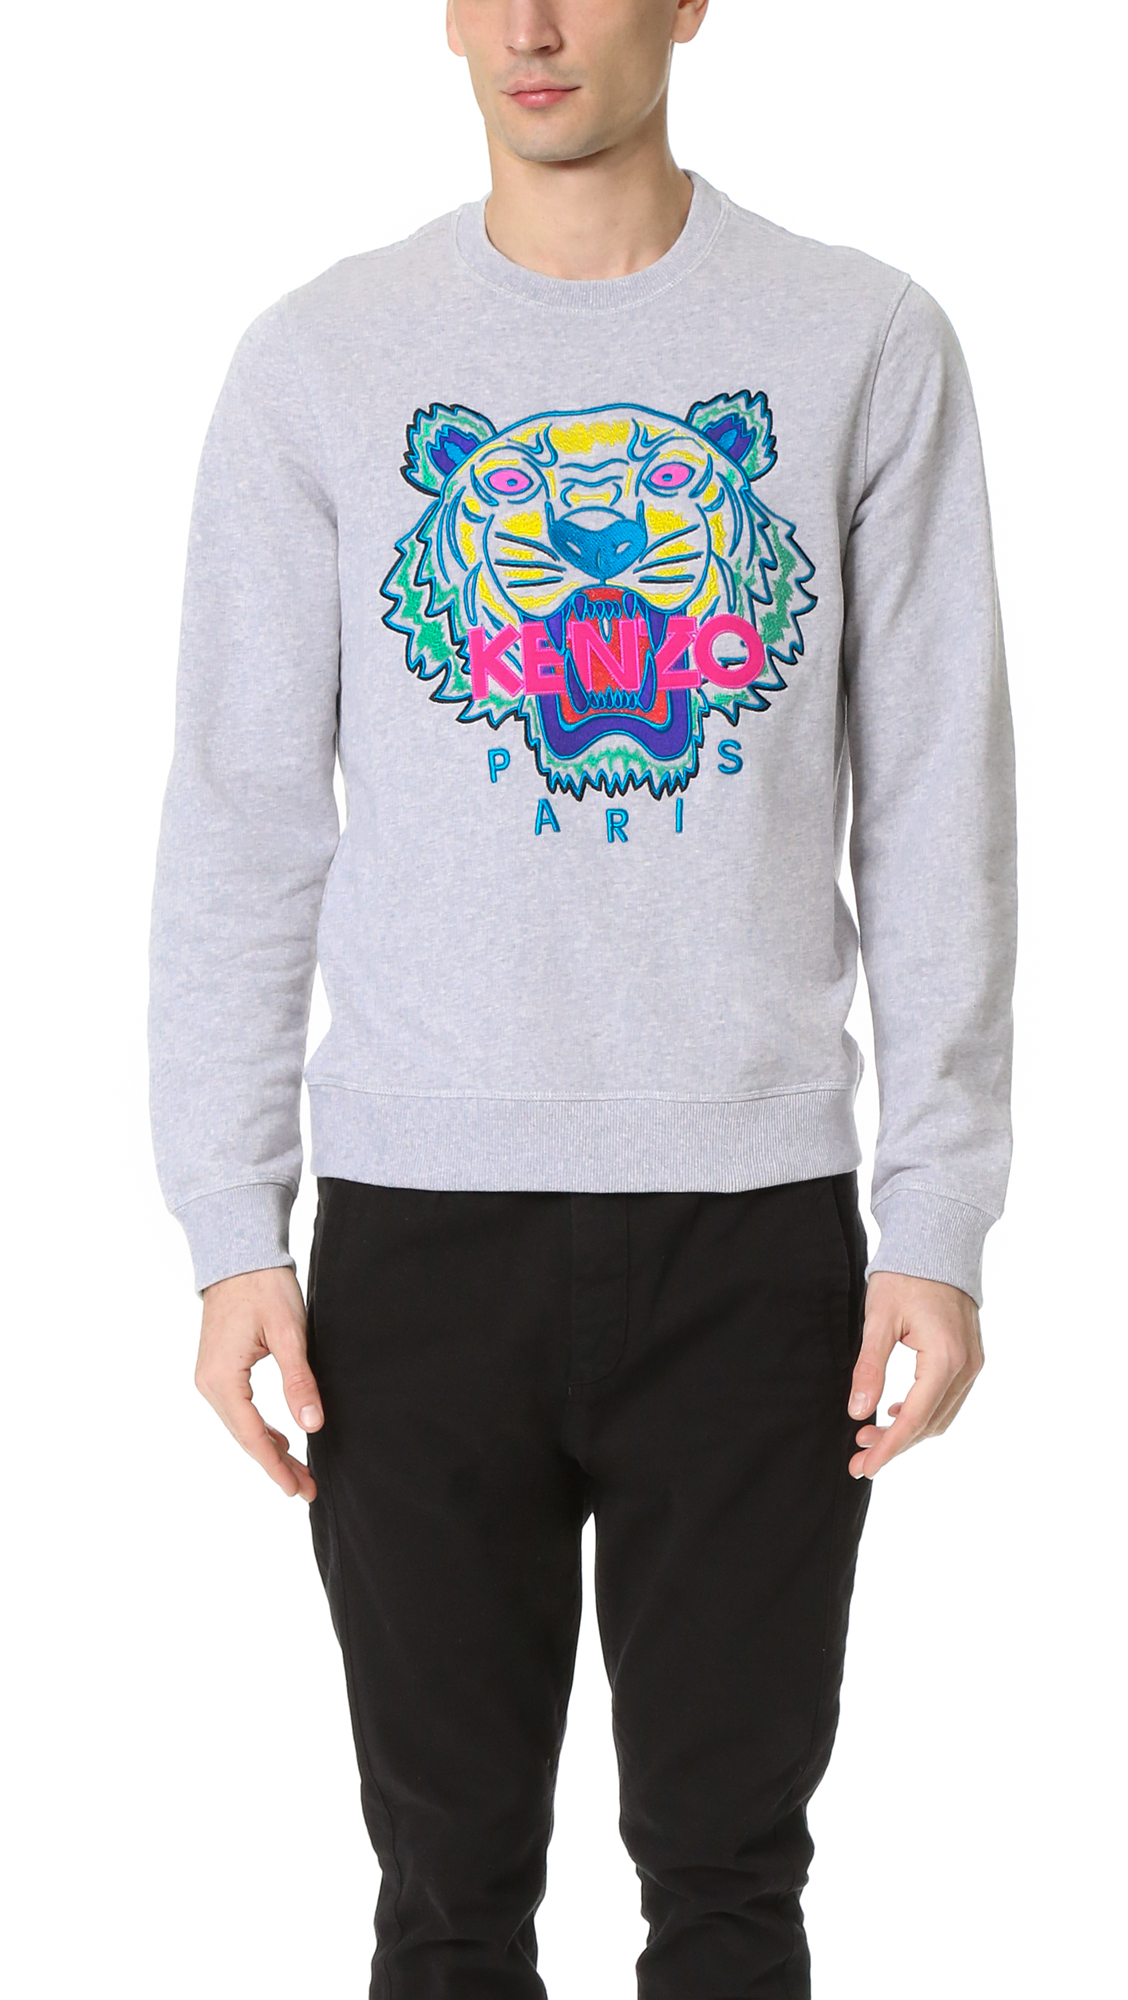 Lyst - KENZO Tiger Sweatshirt in White for Men 6b3cf2491